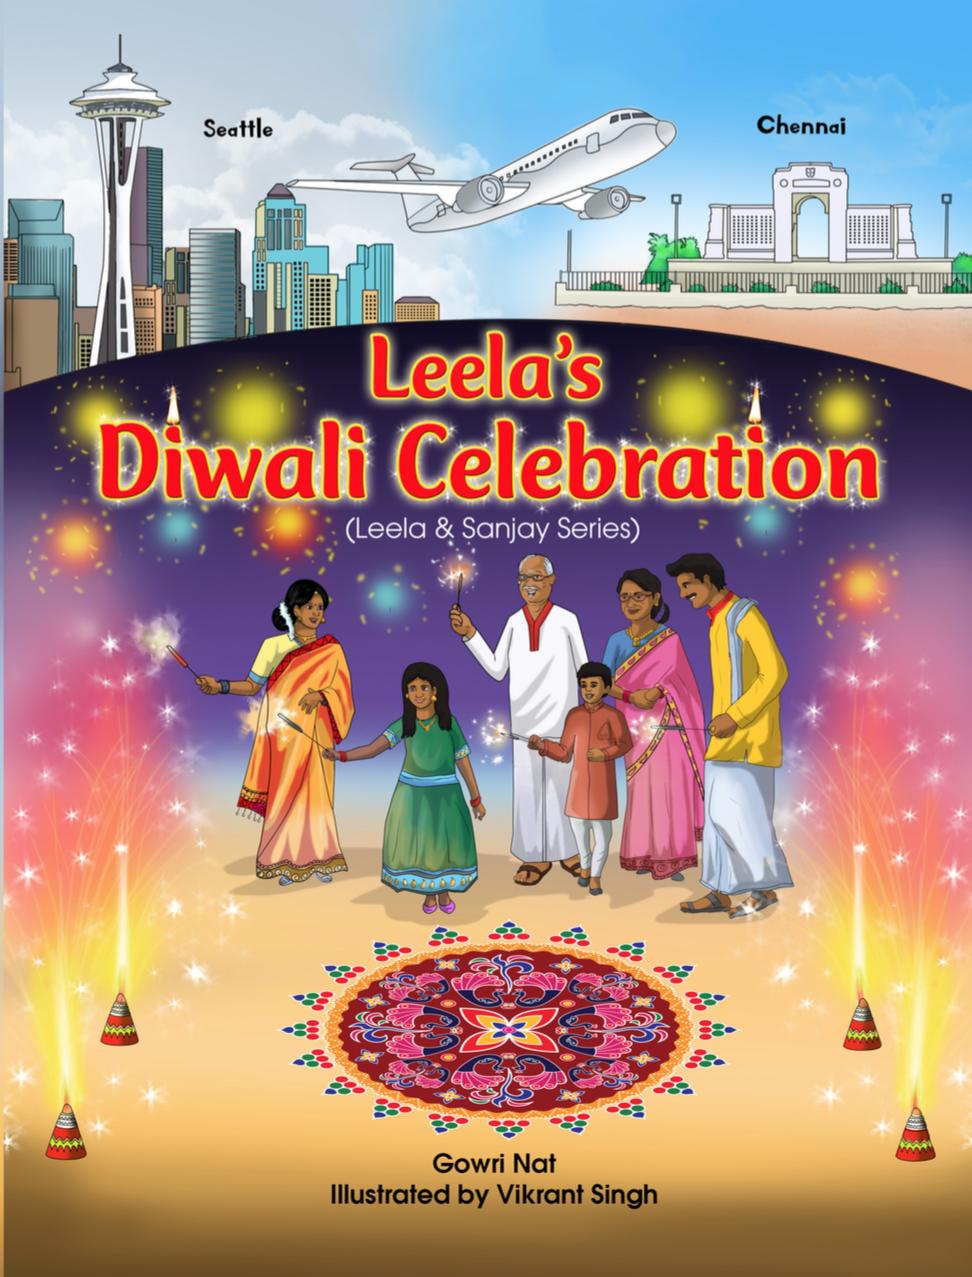 Leela's Diwali Celebration